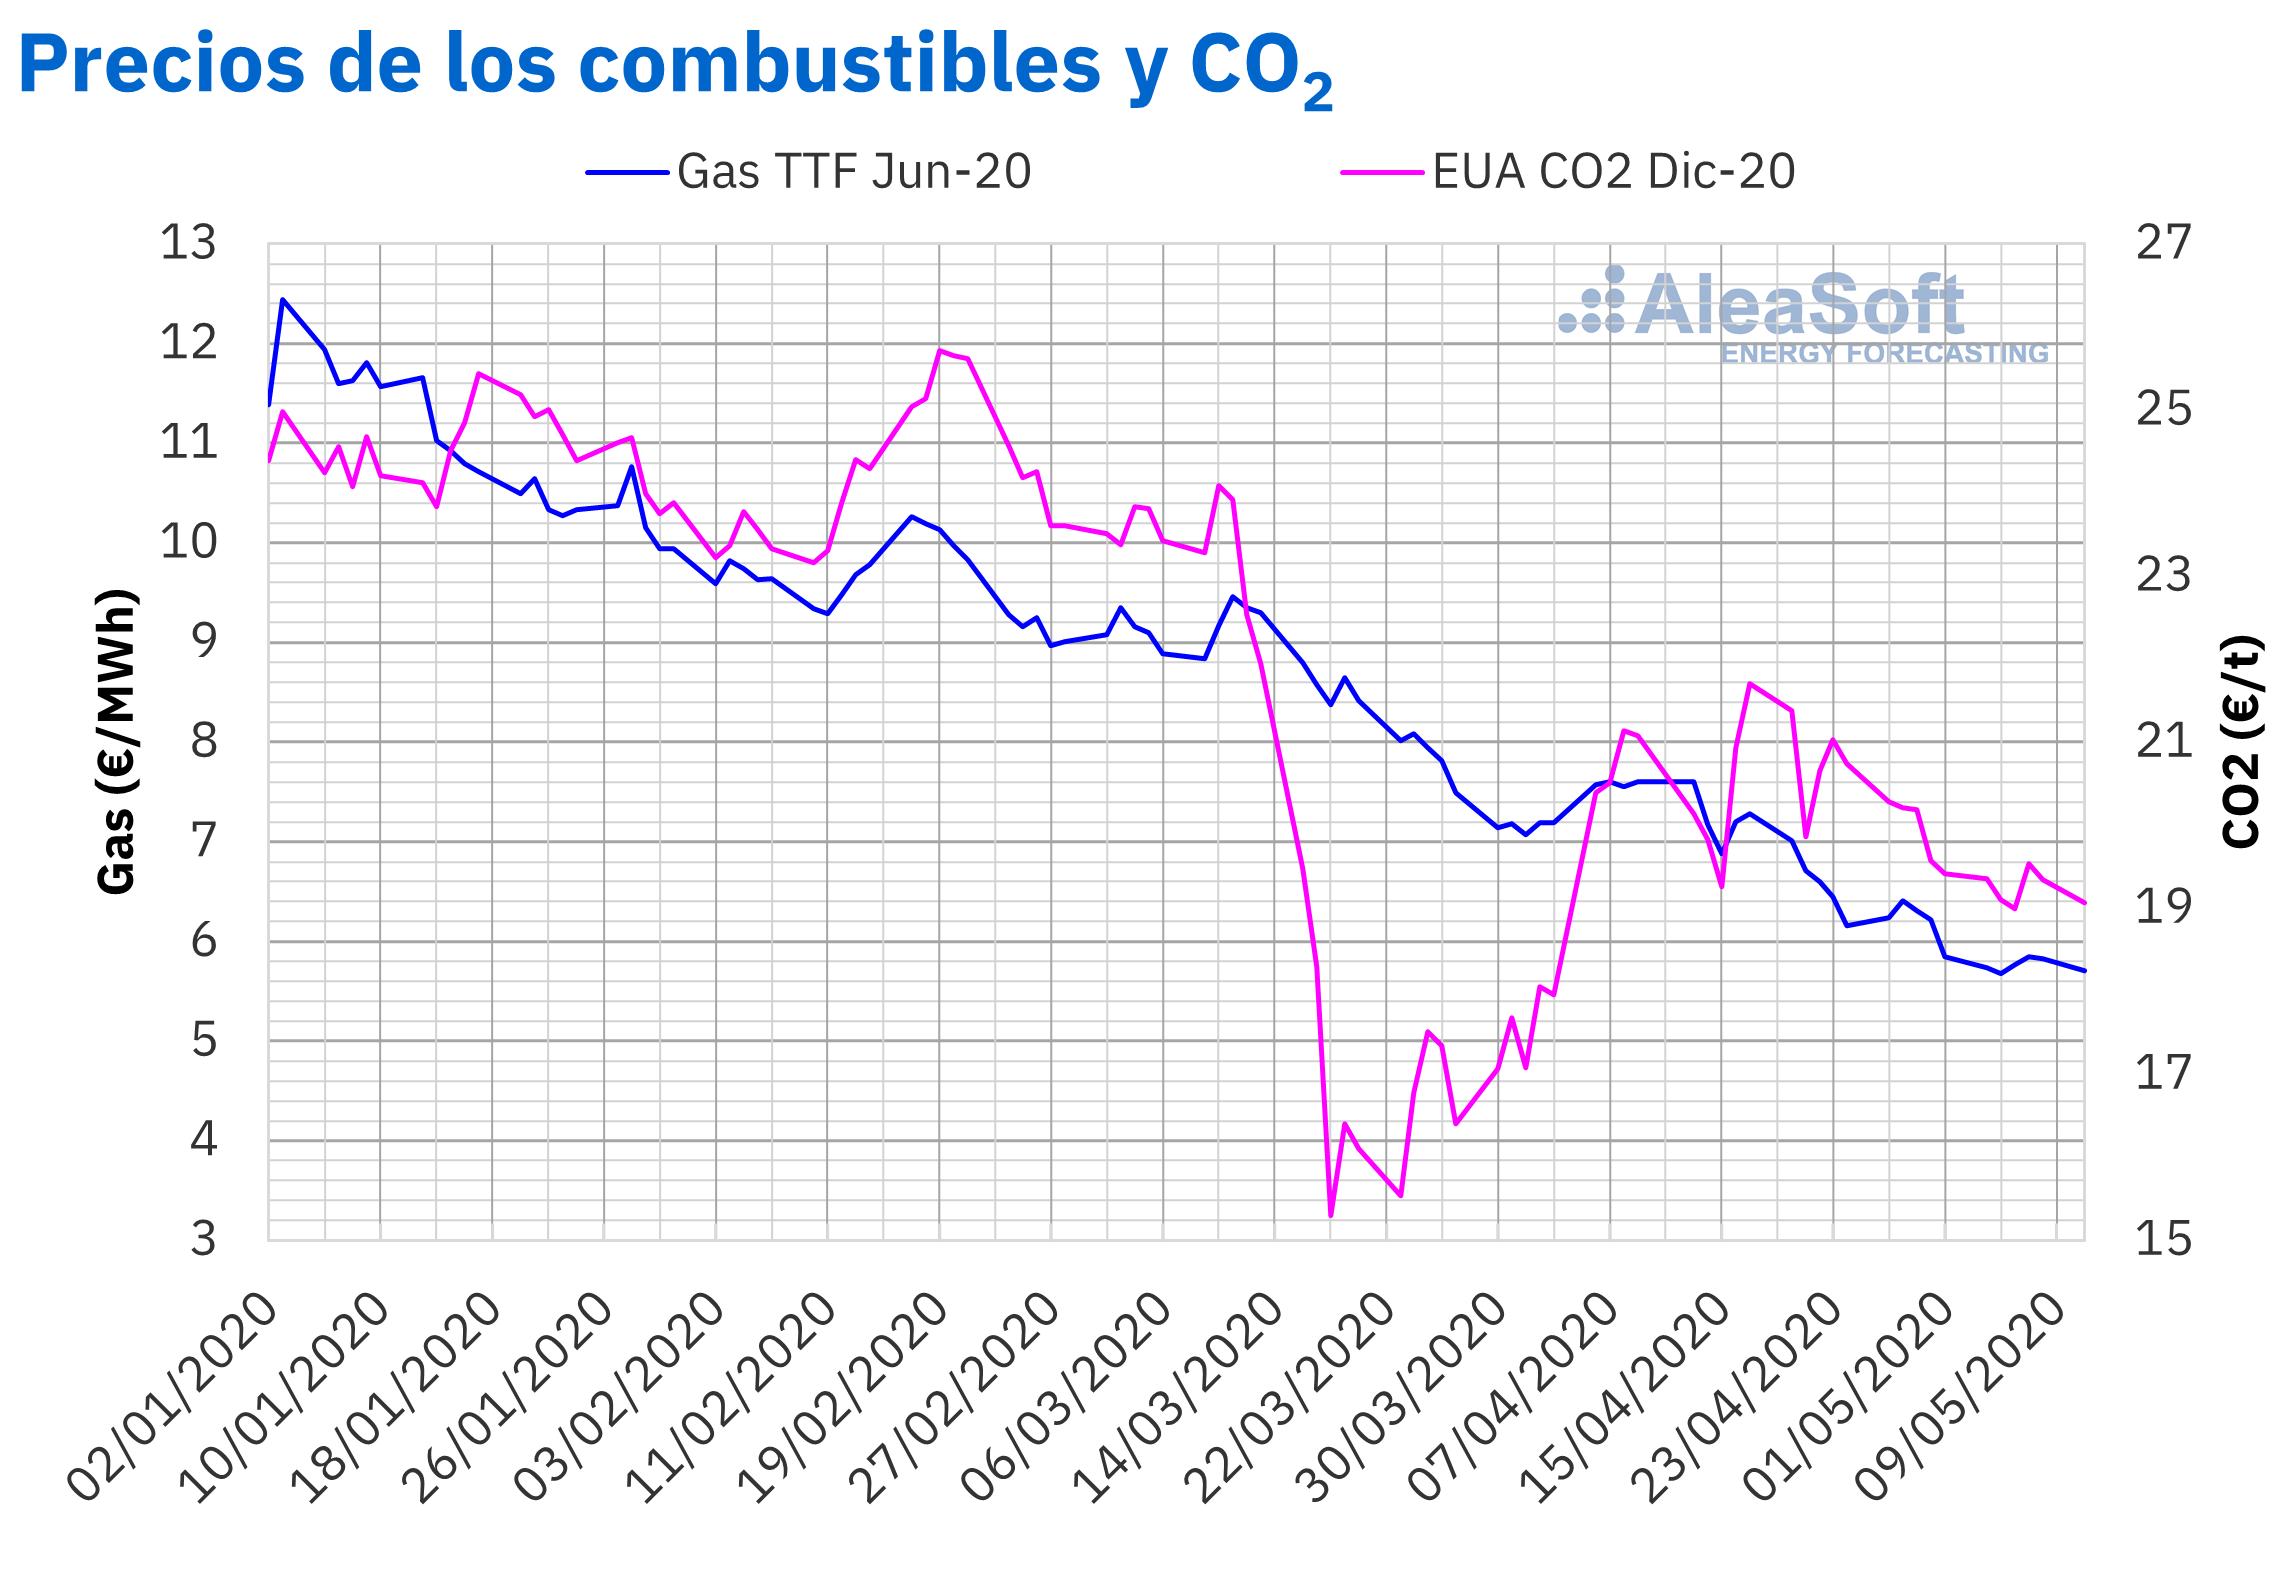 AleaSoft - Precios gas CO2